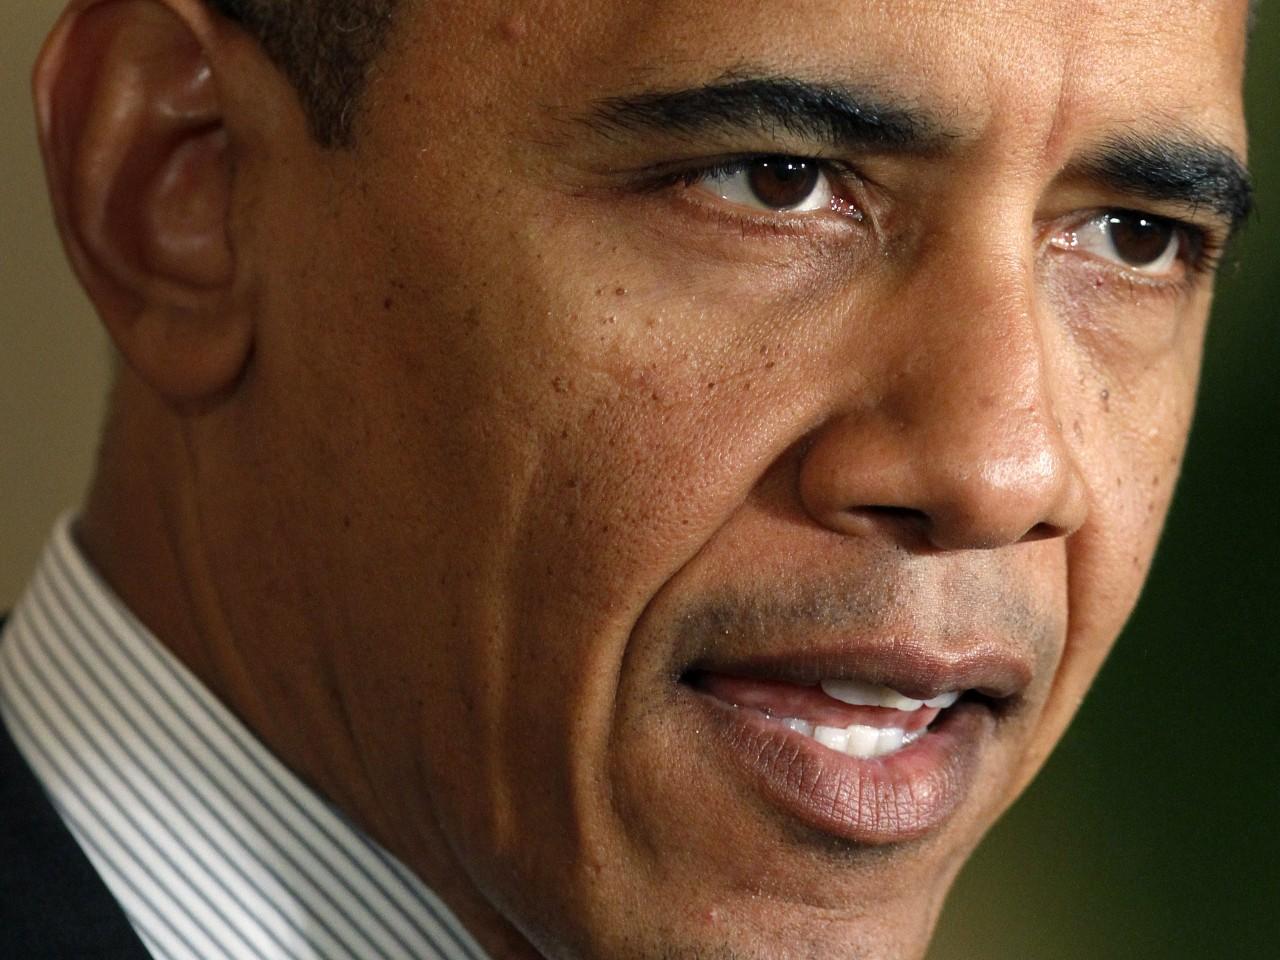 ObamaFuhrer